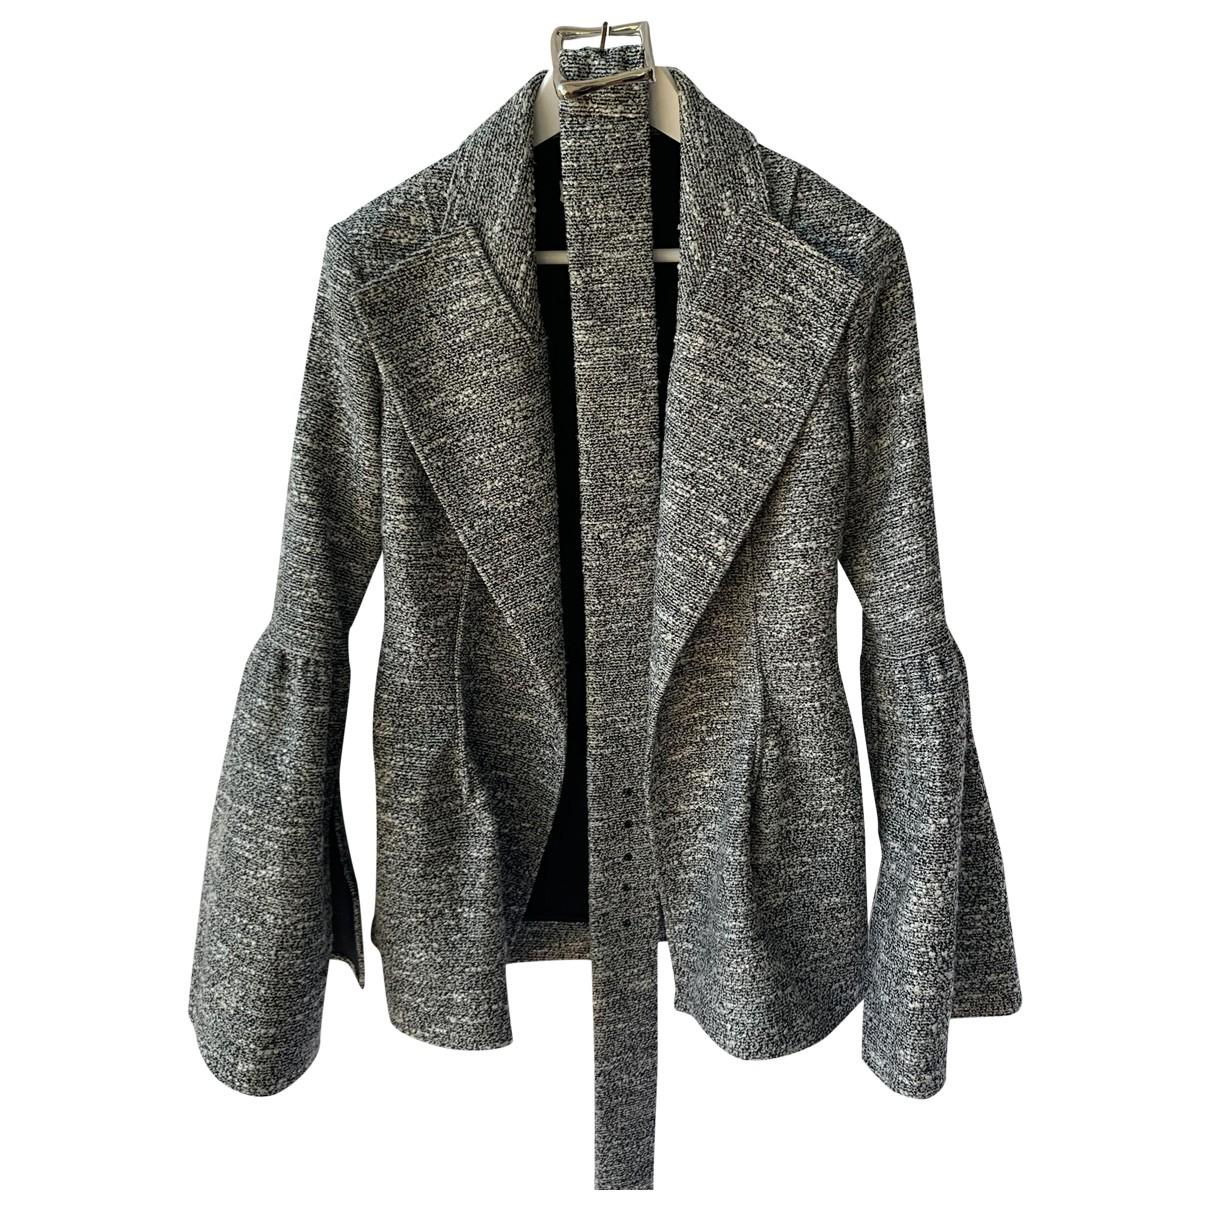 Rejina Pyo \N Jacke in  Grau Polyester